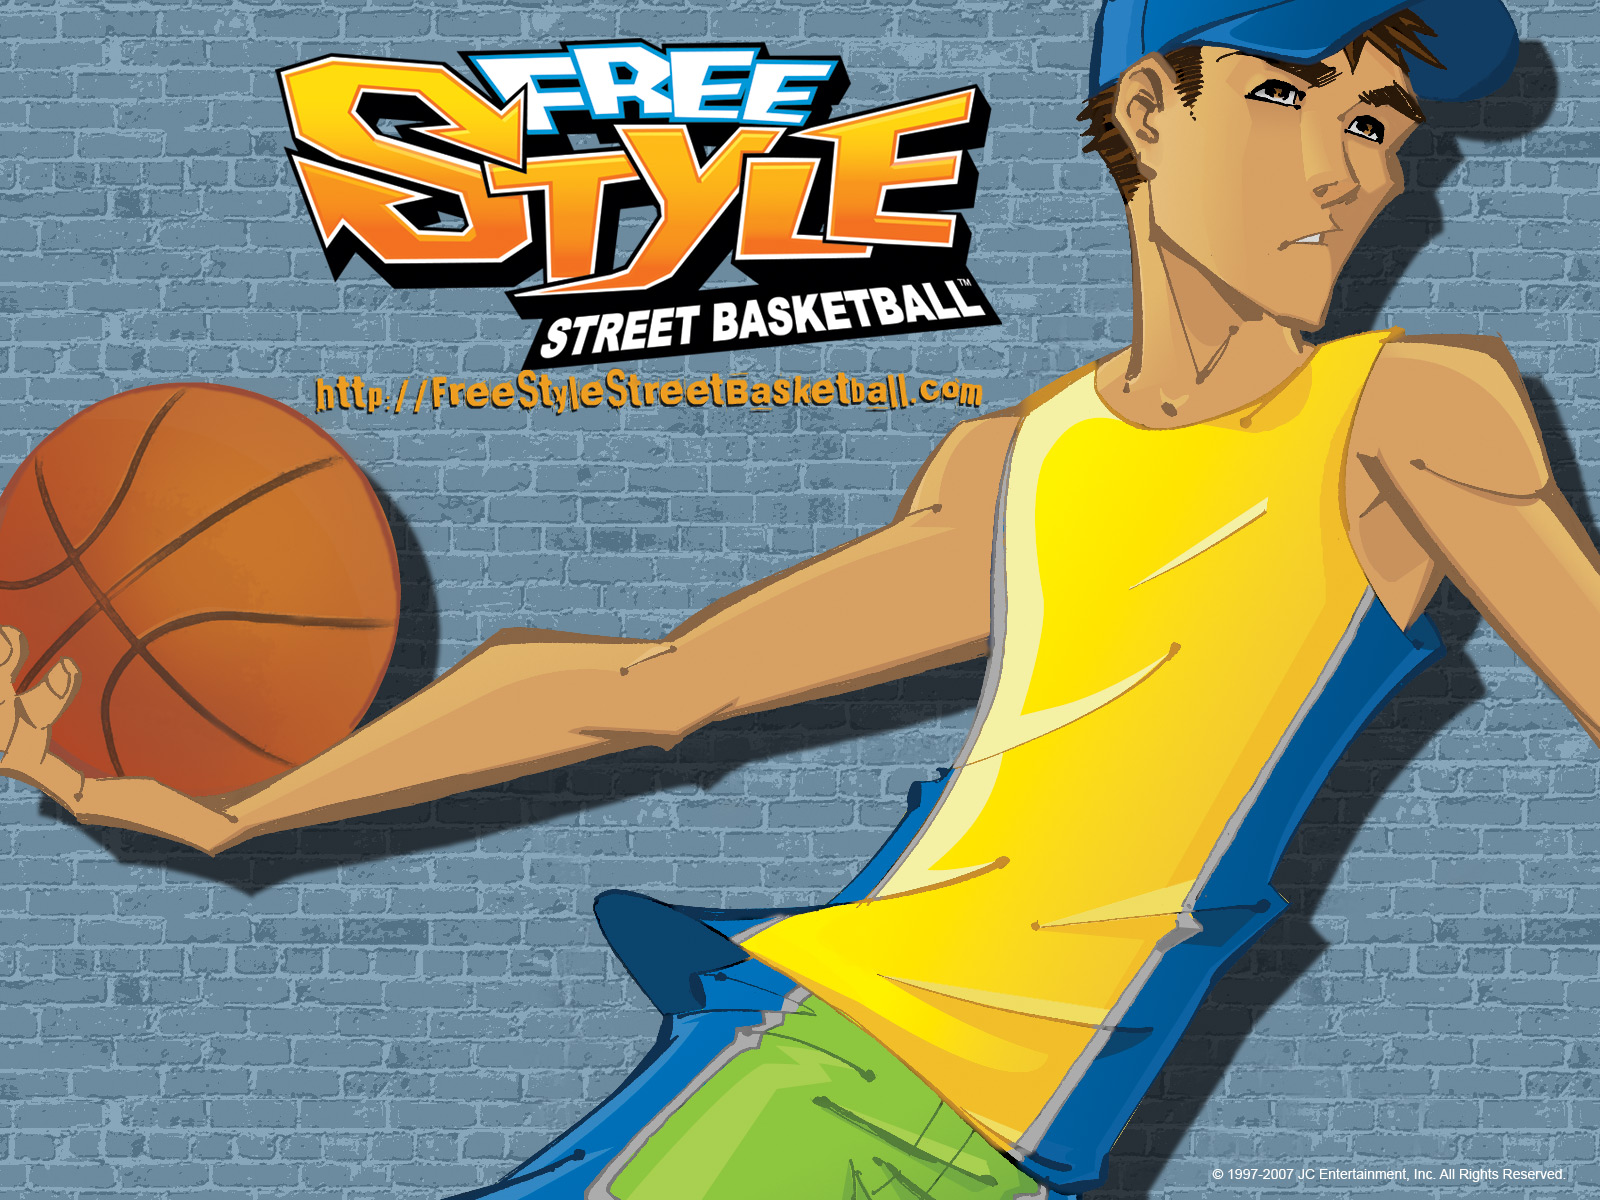 freestyle street basketball (1)